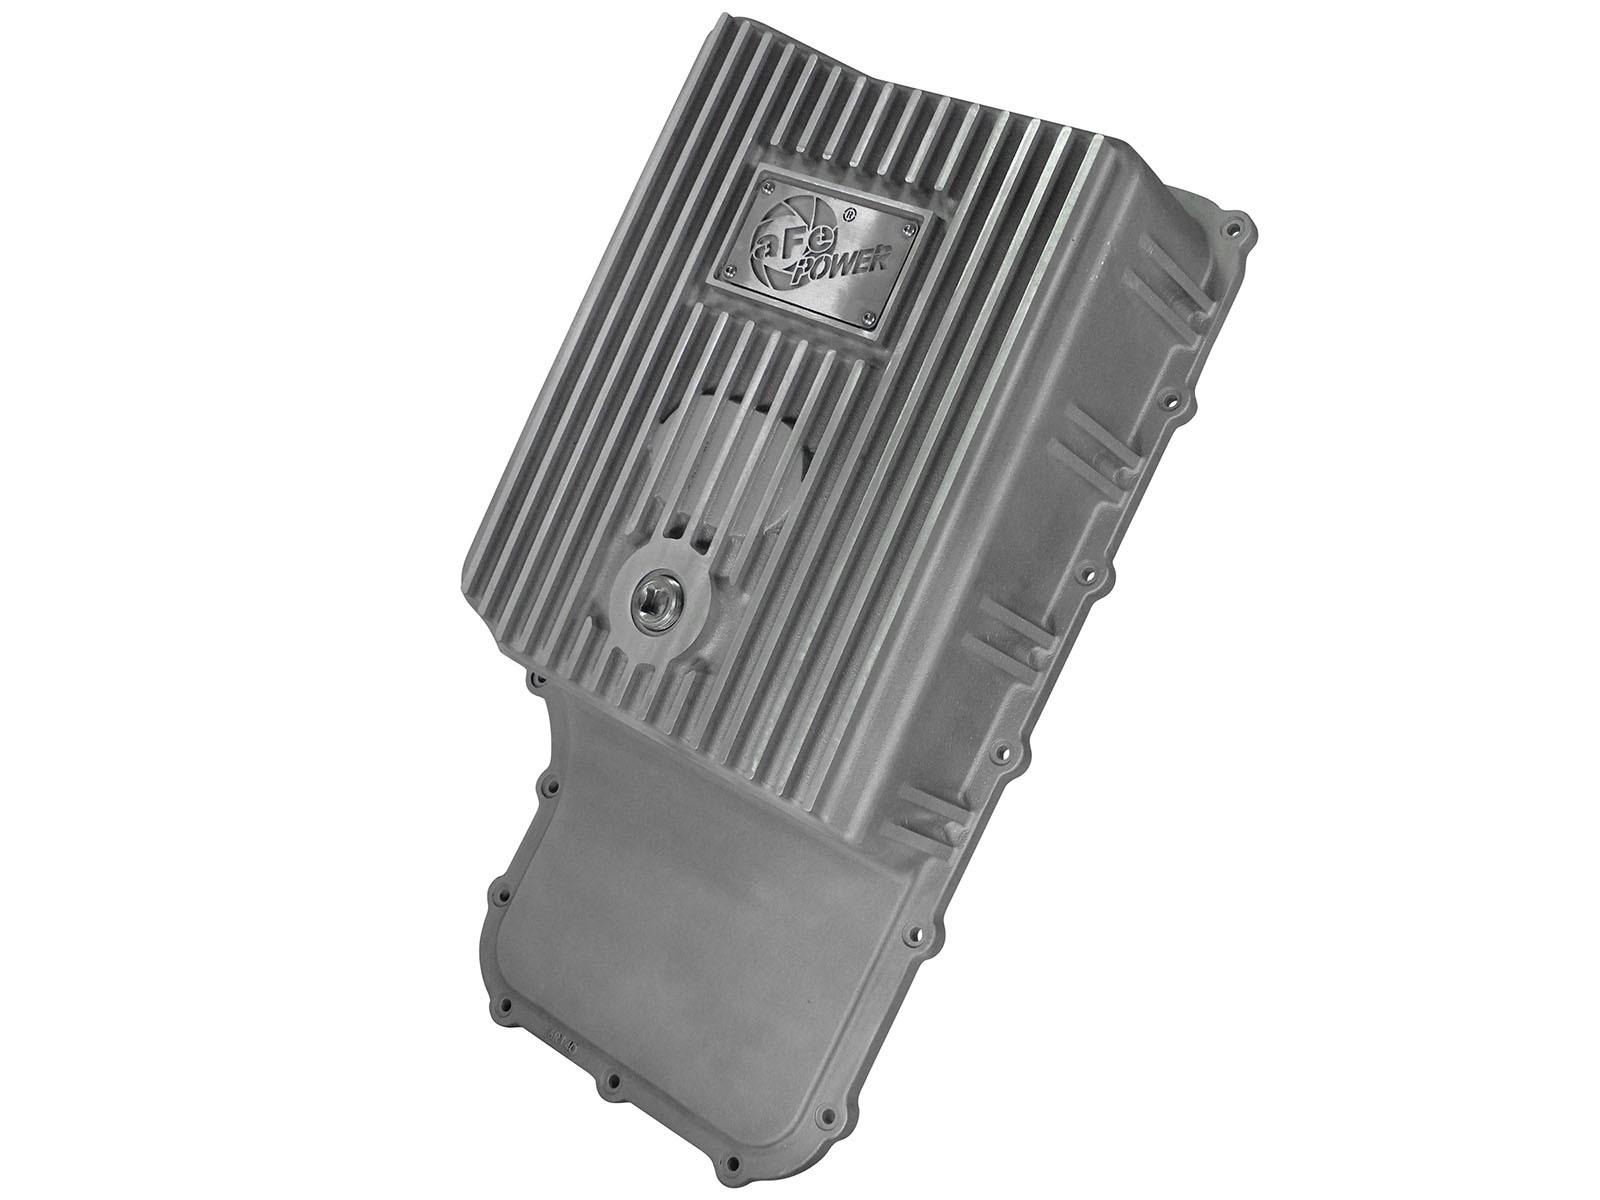 aFe POWER 46-70180 Transmission Pan, Machined Fins